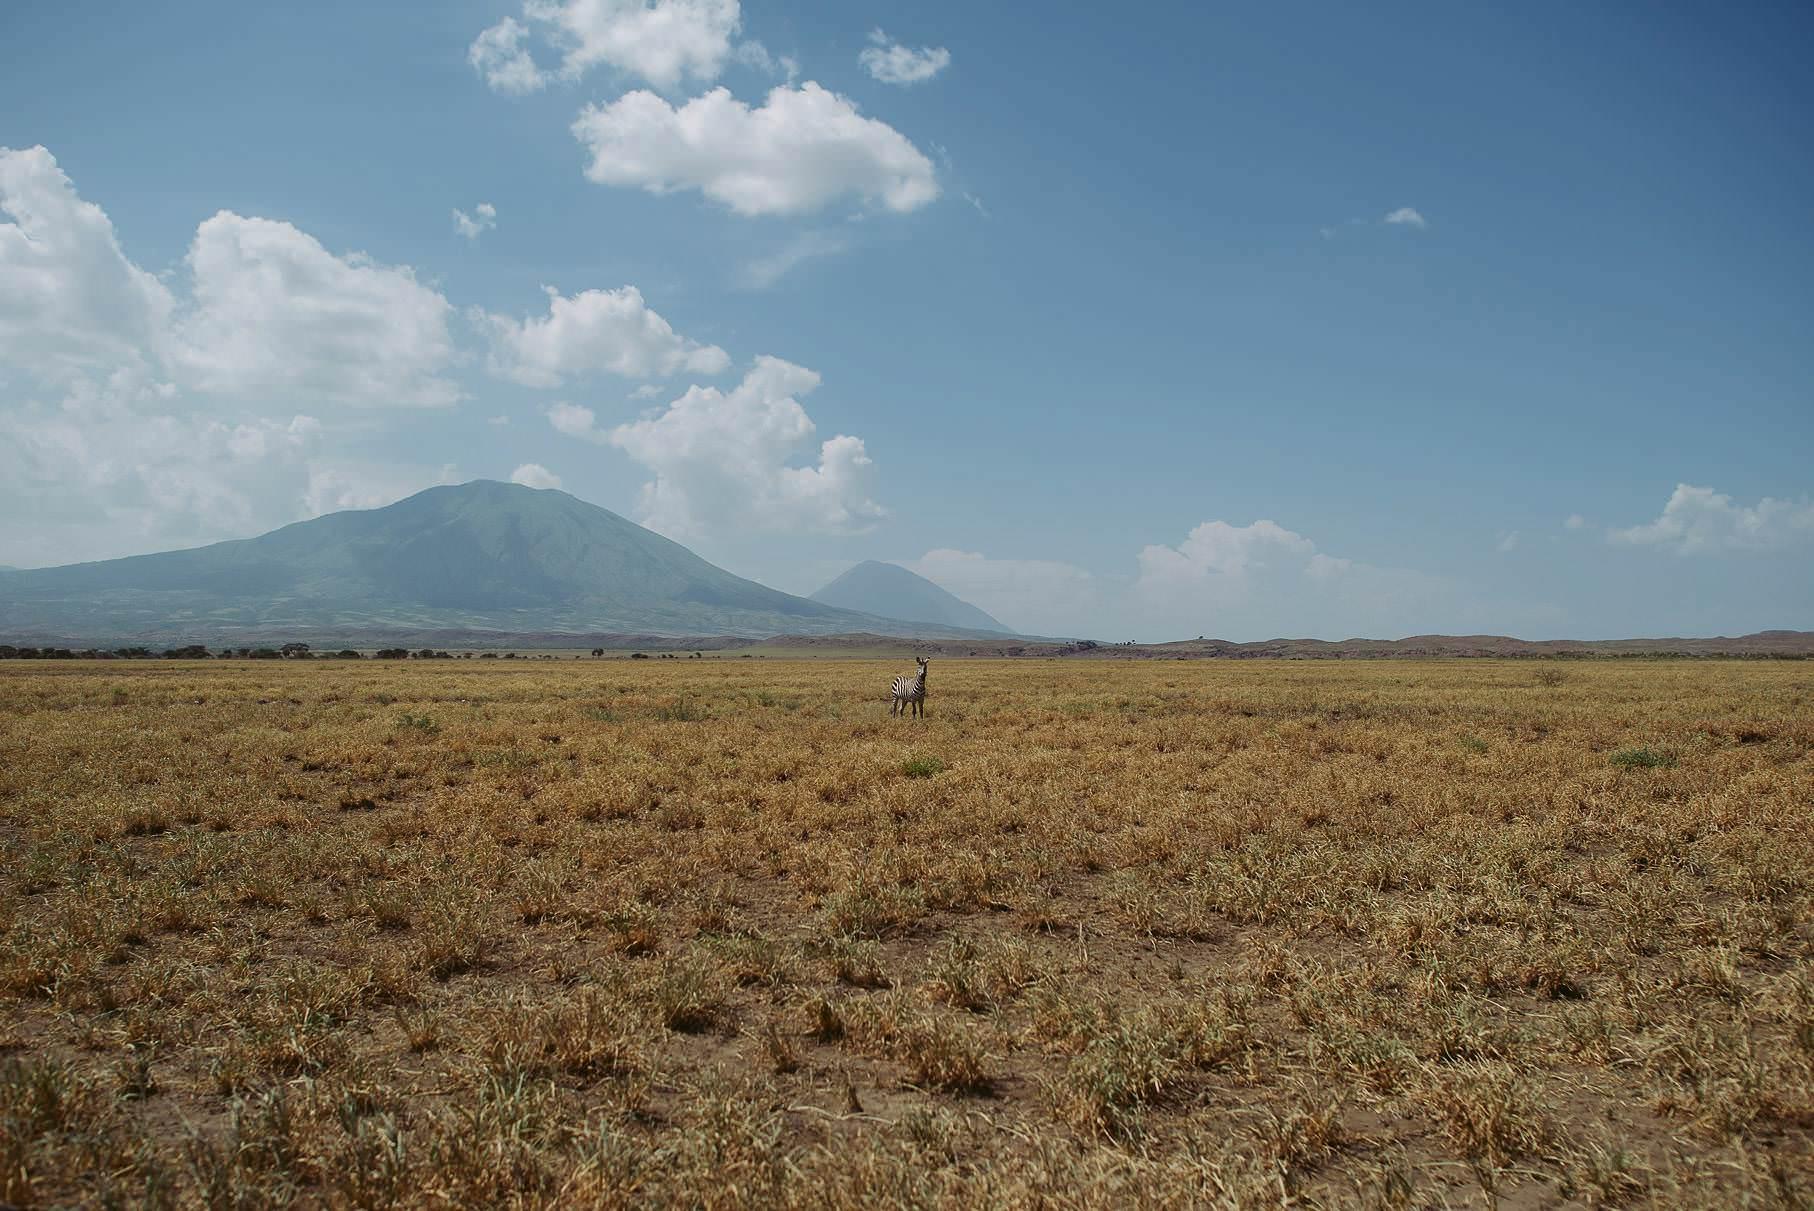 0016 tansania nd8 9515 anne bjoern fotografie hochzeitsfotograf hamburg - This is Tanzania - Serengeti, Kilimanjaro & Sansibar